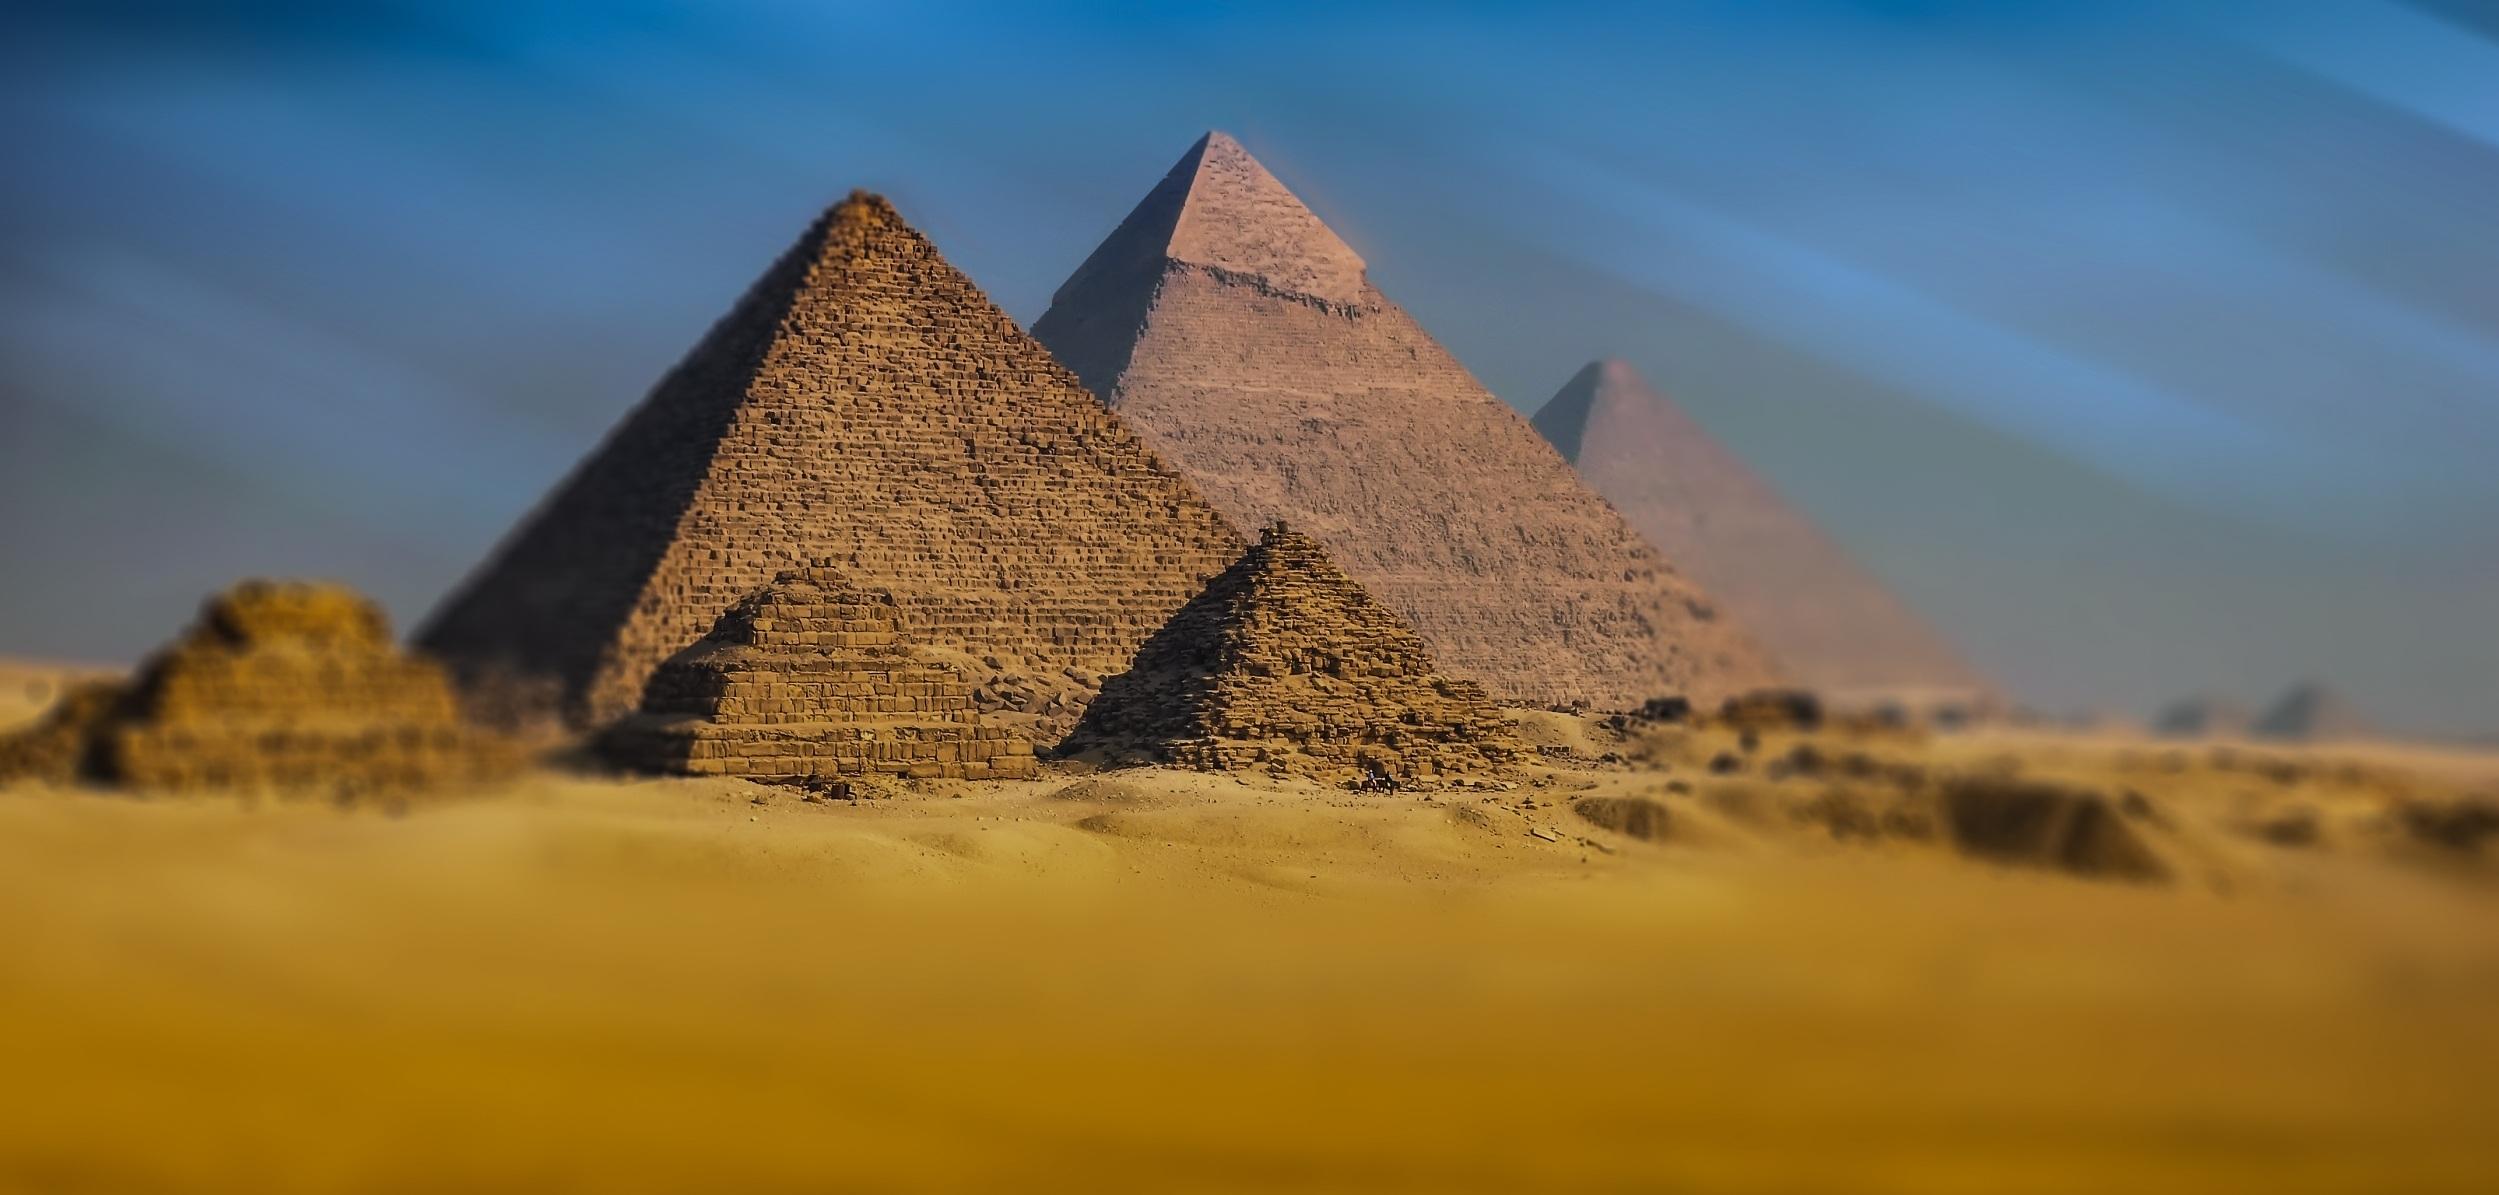 Landscape sand wilderness monument pyramid landmark 1032536 pxhere